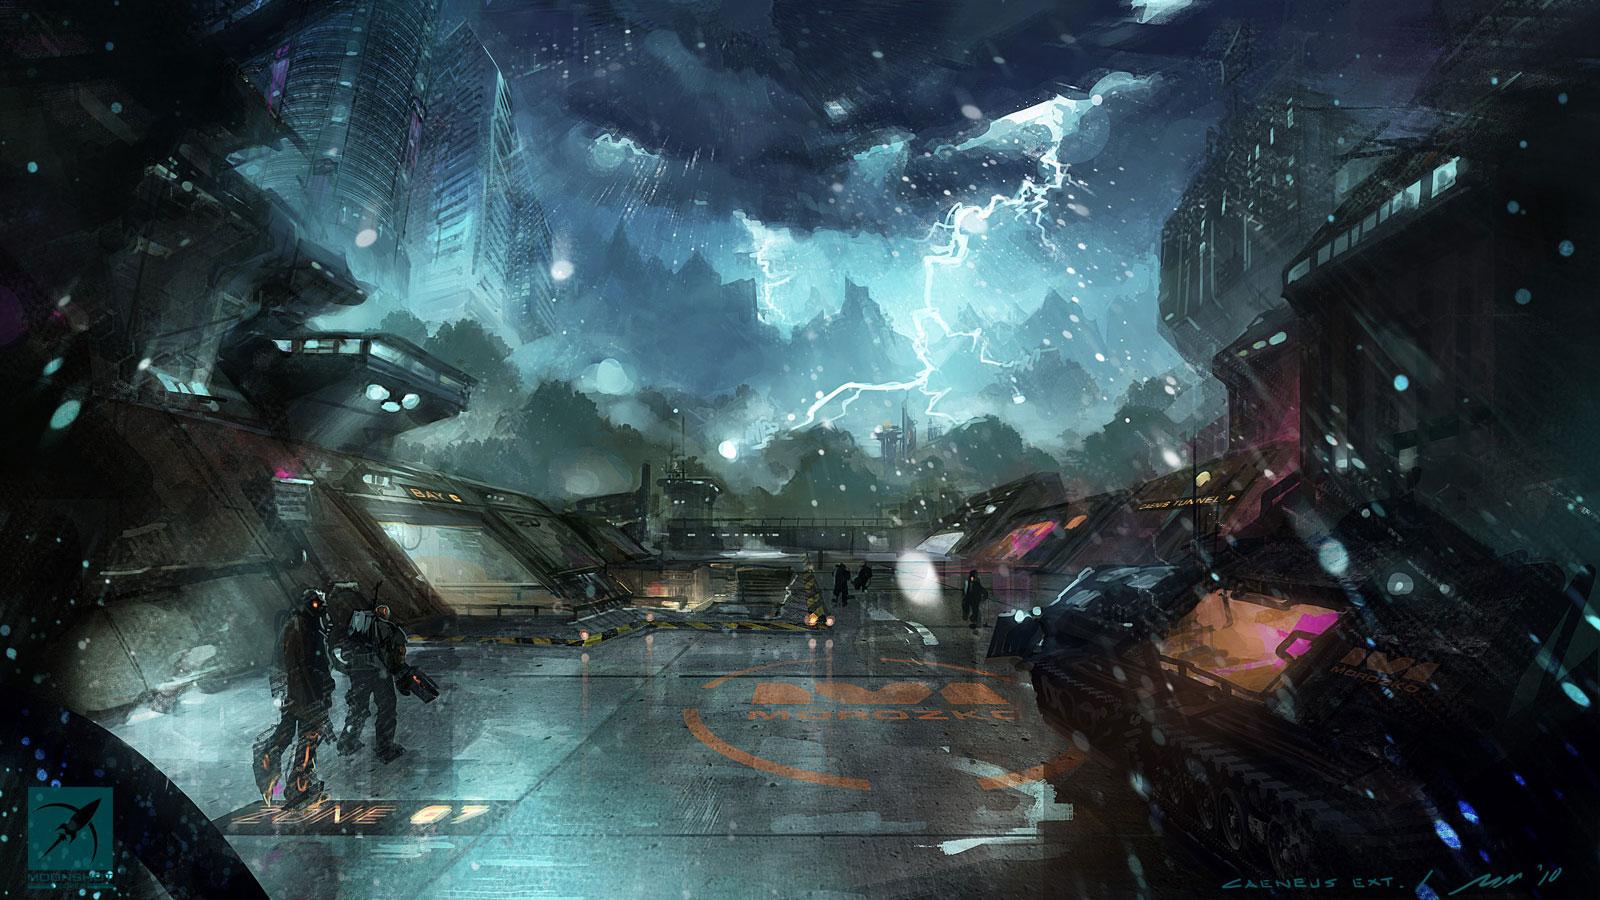 Sci fi Wallpaper of the week 39   Concept art Sci fi Videogames 1600x900